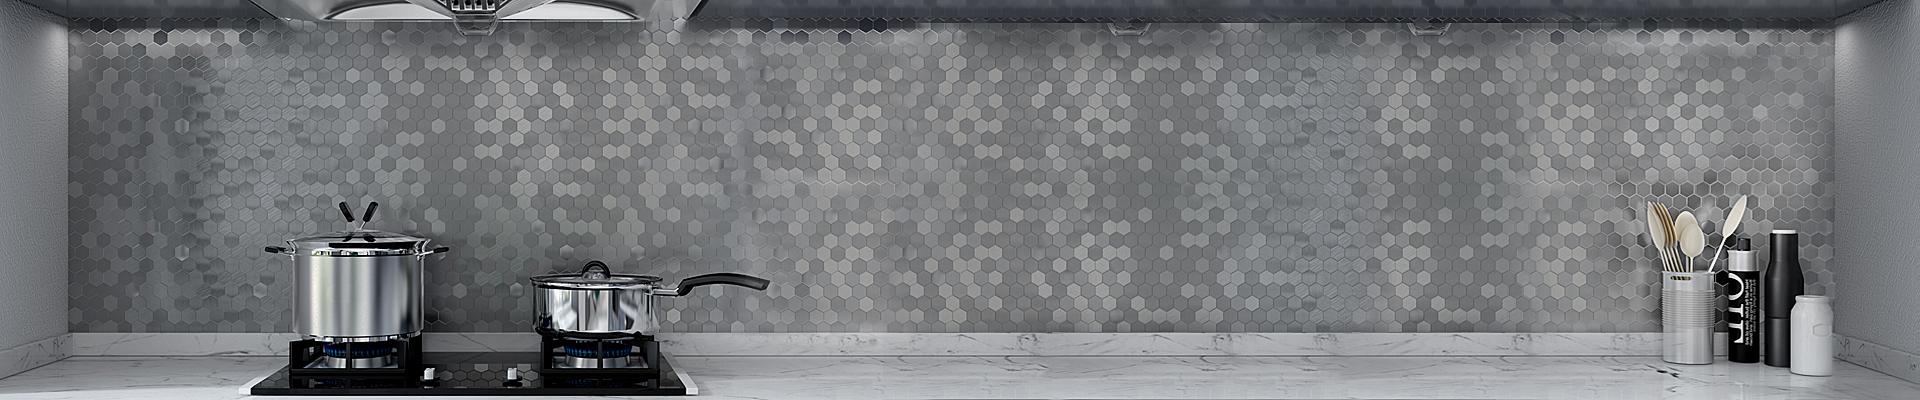 video-metal mosaic tile in shower brown for living room Heng Xing-Heng Xing-img